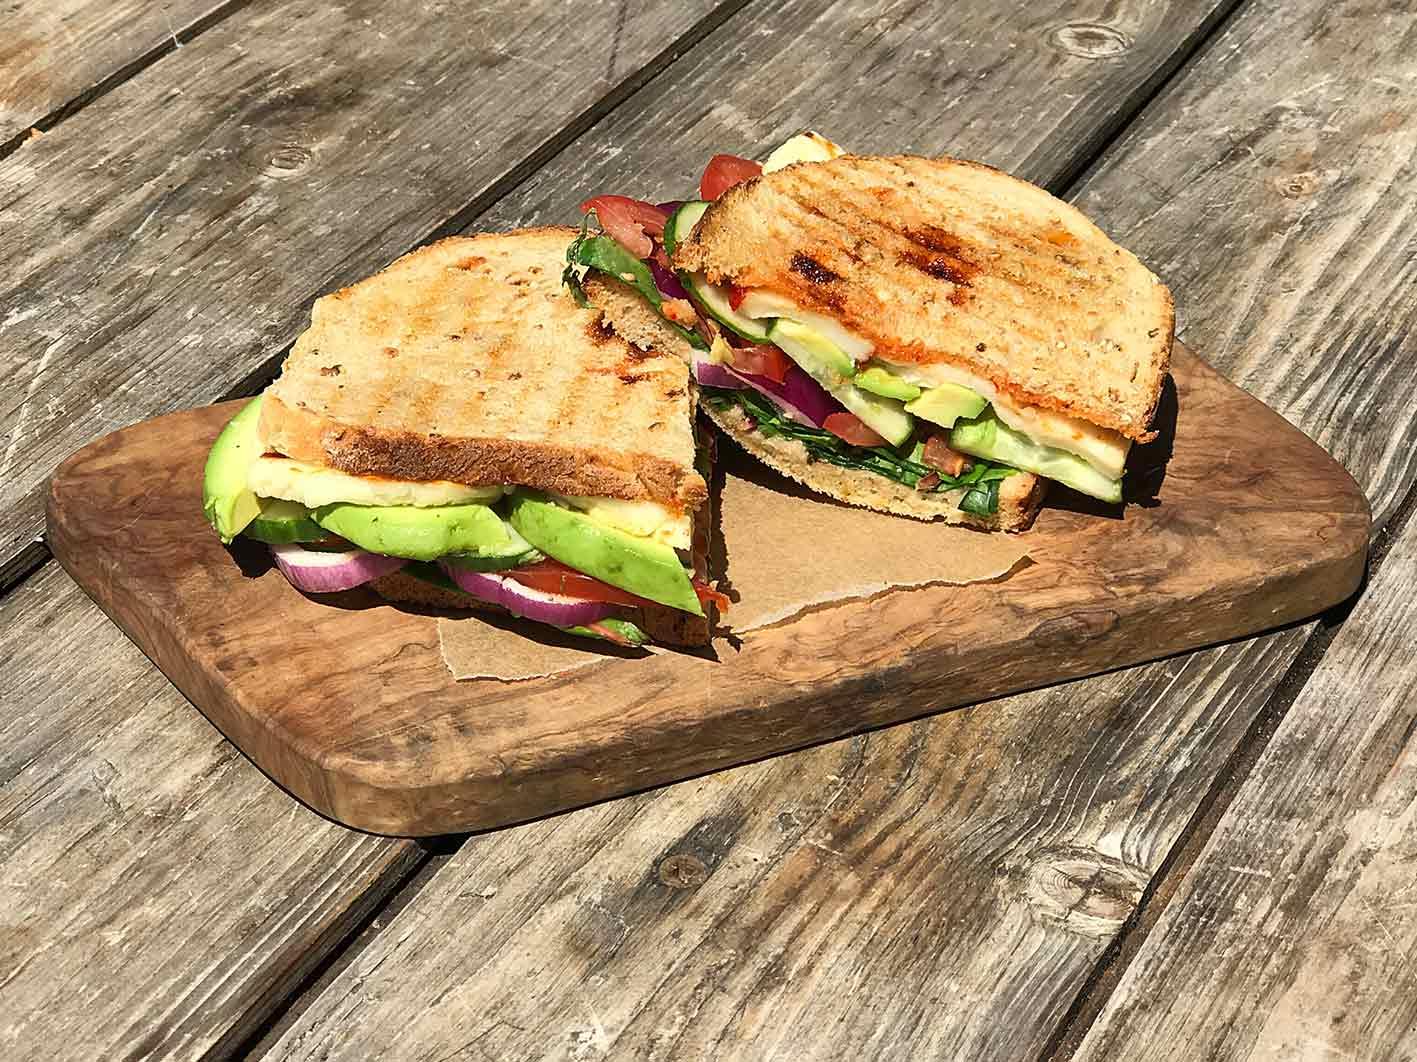 Dancing-Goat-vegetarian-sandwiches.jpg